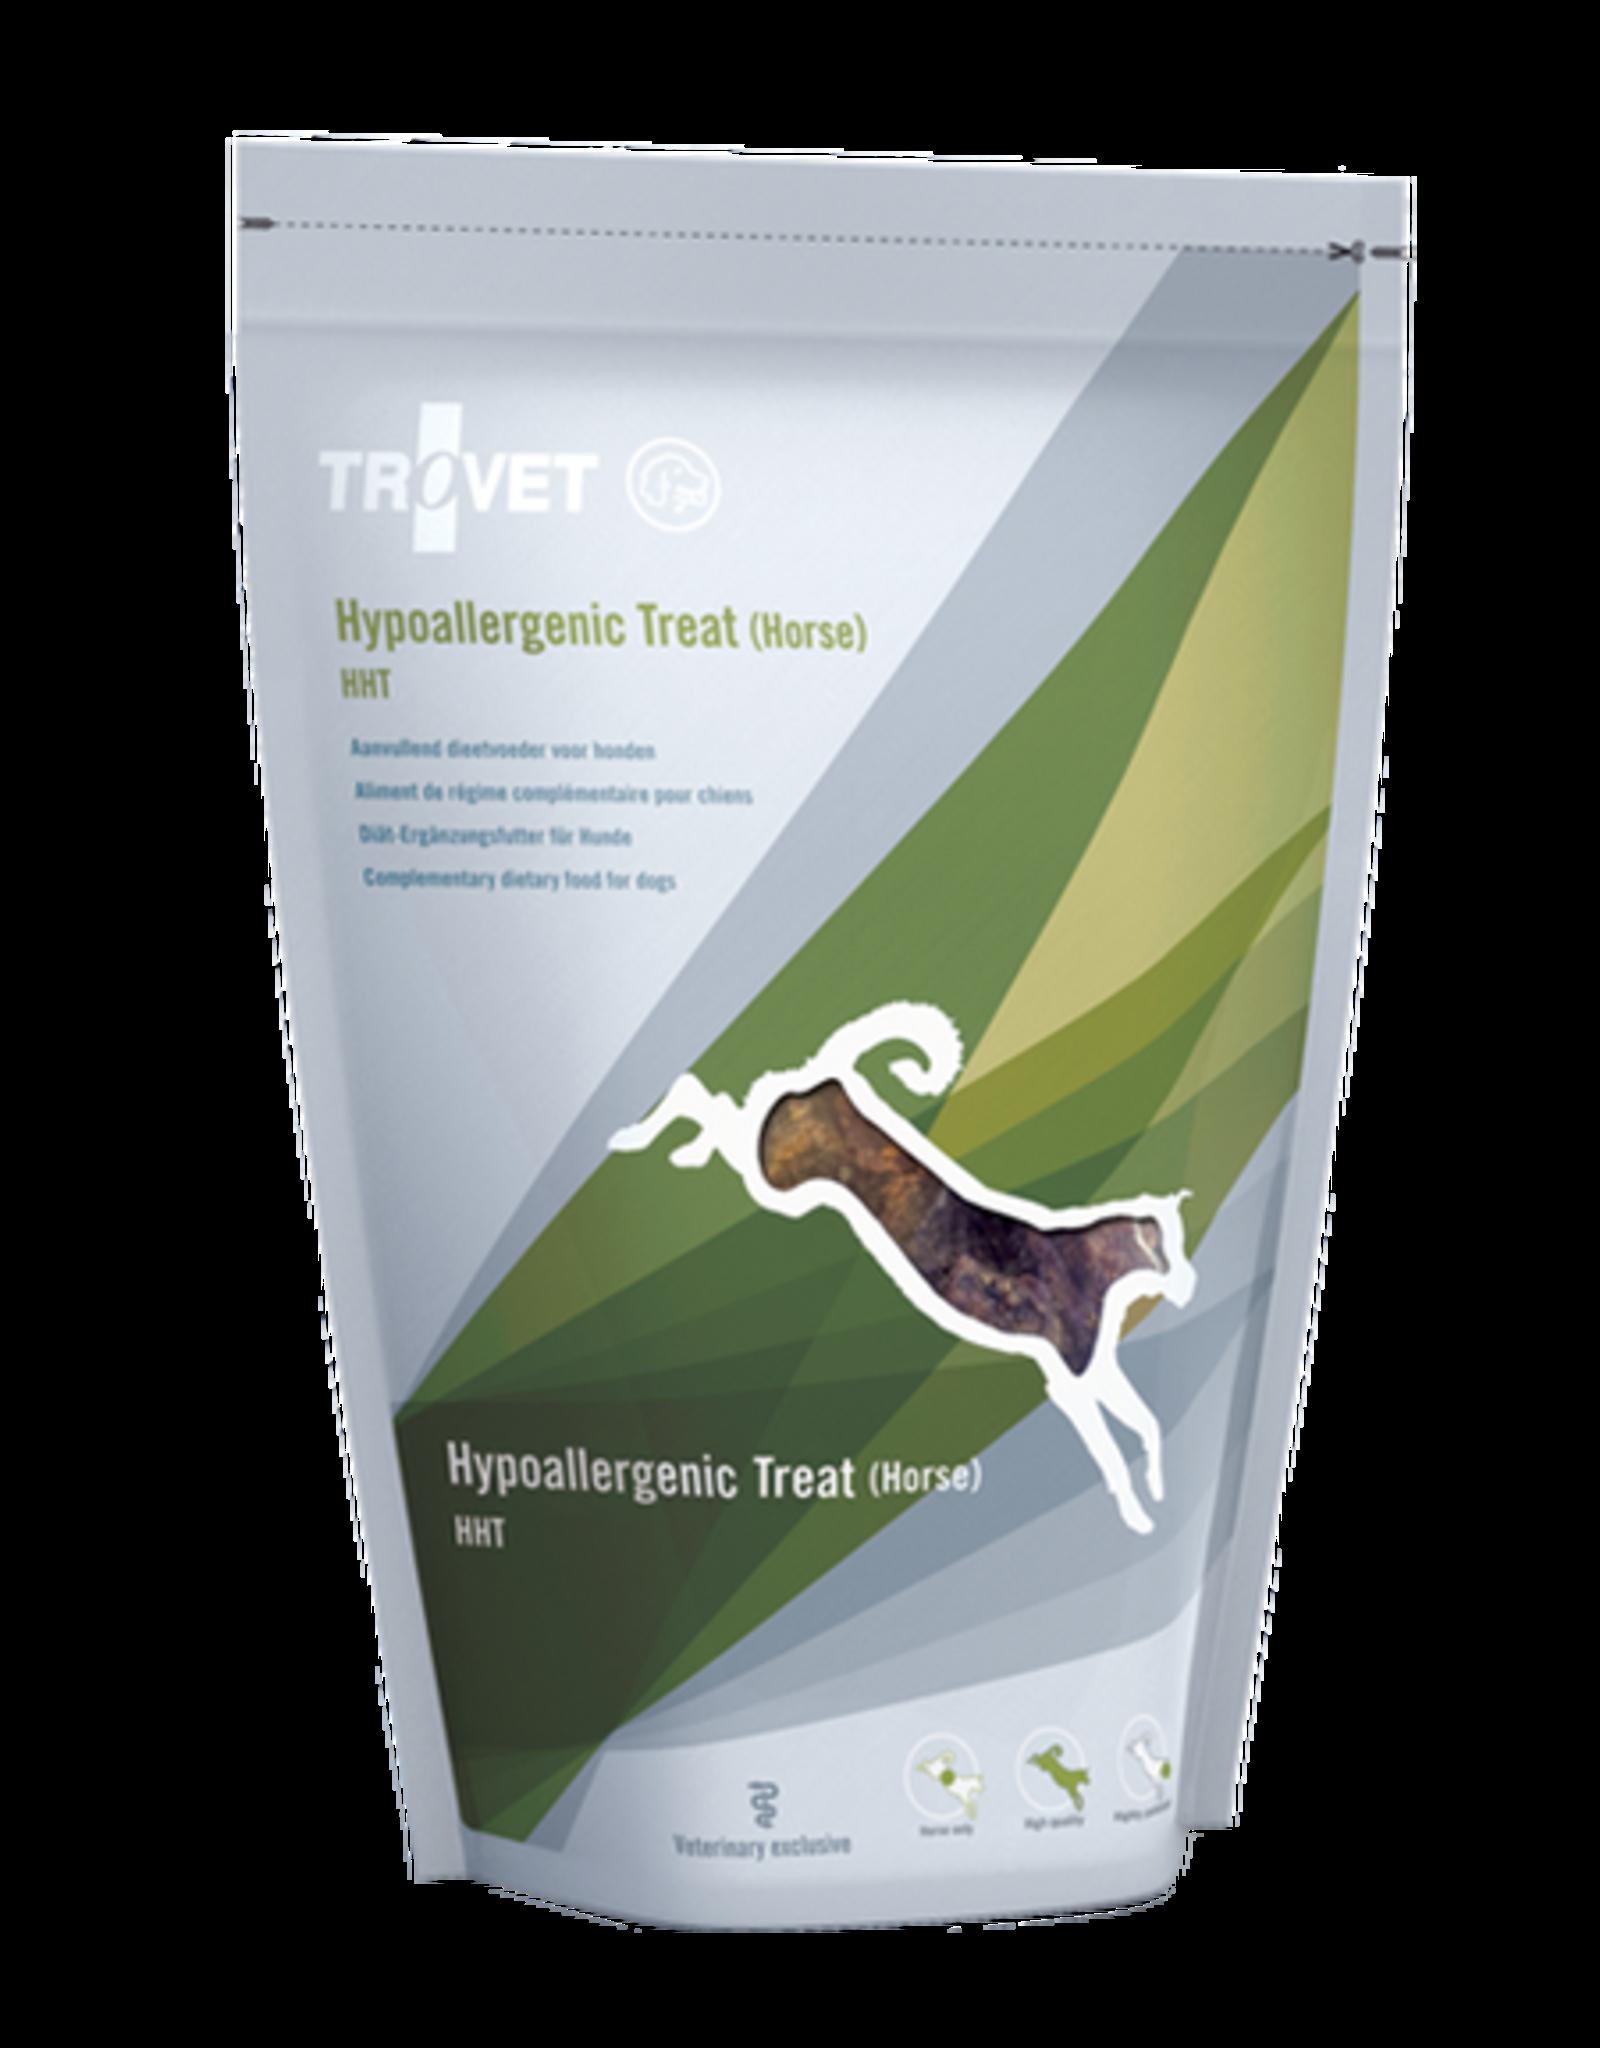 Trovet Trovet Canine Hht Hypoallergenic Treat Horse 250g